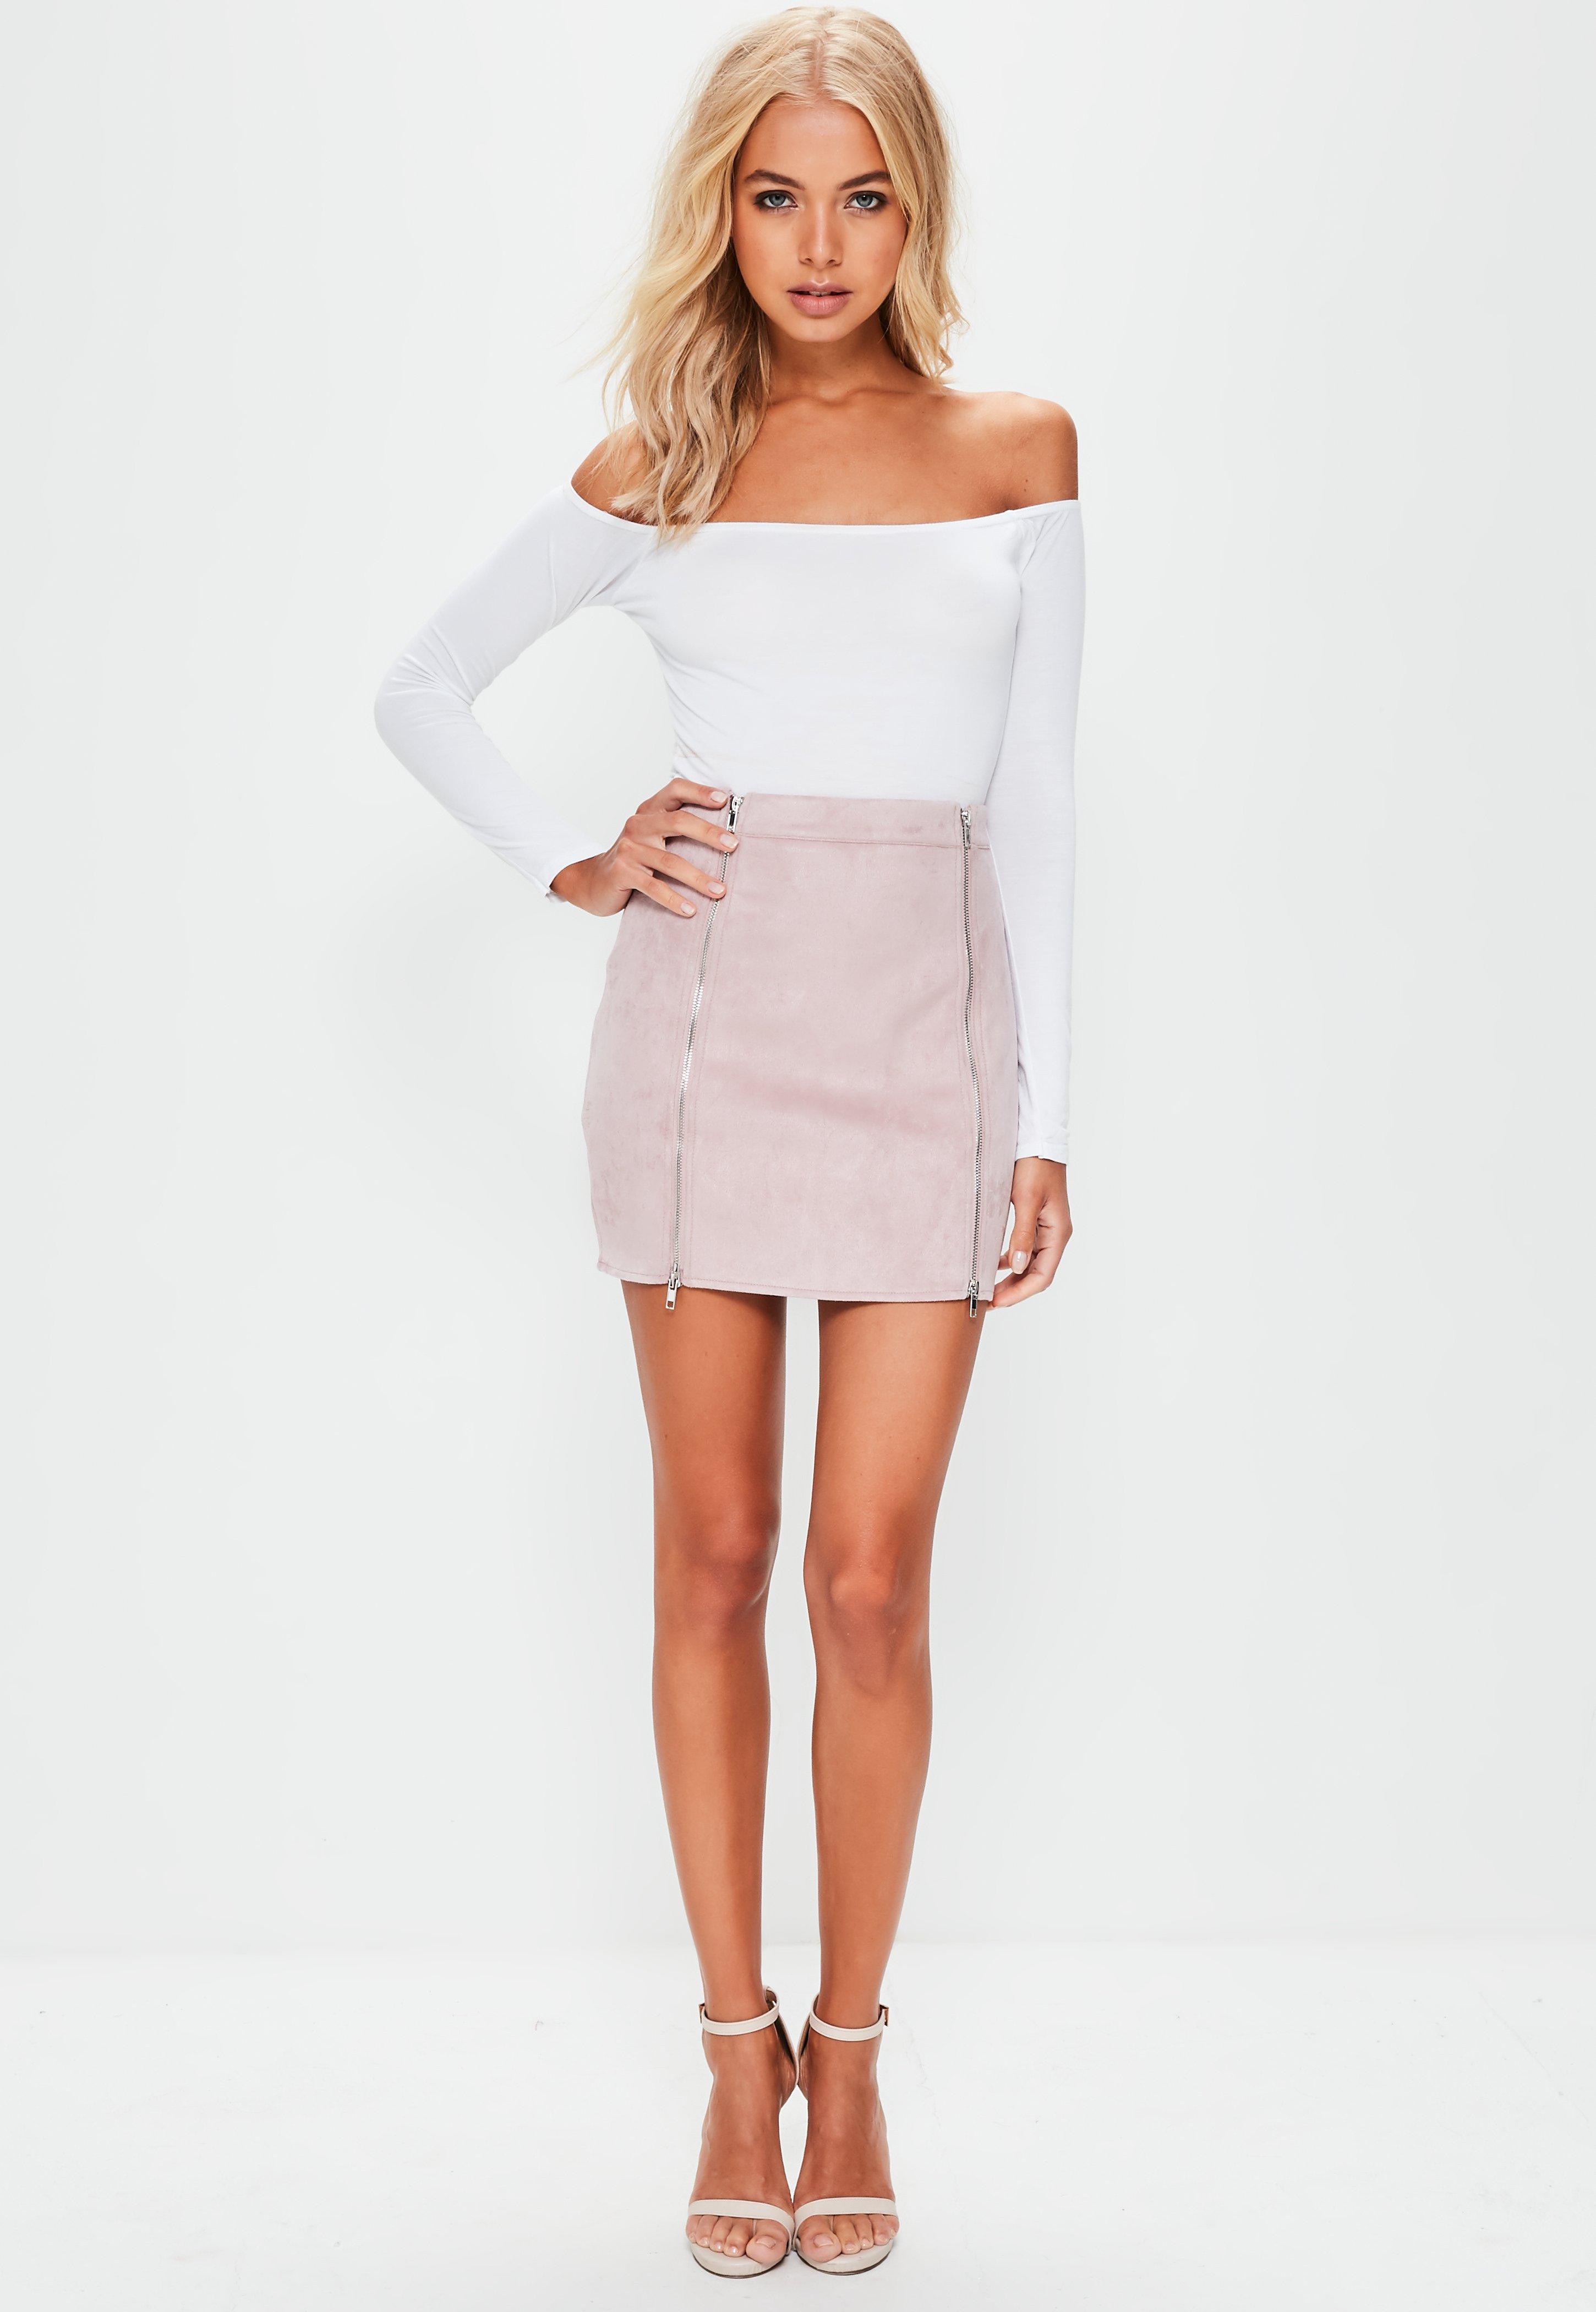 Vêtements Petite femme - Missguided dd2cb205f756